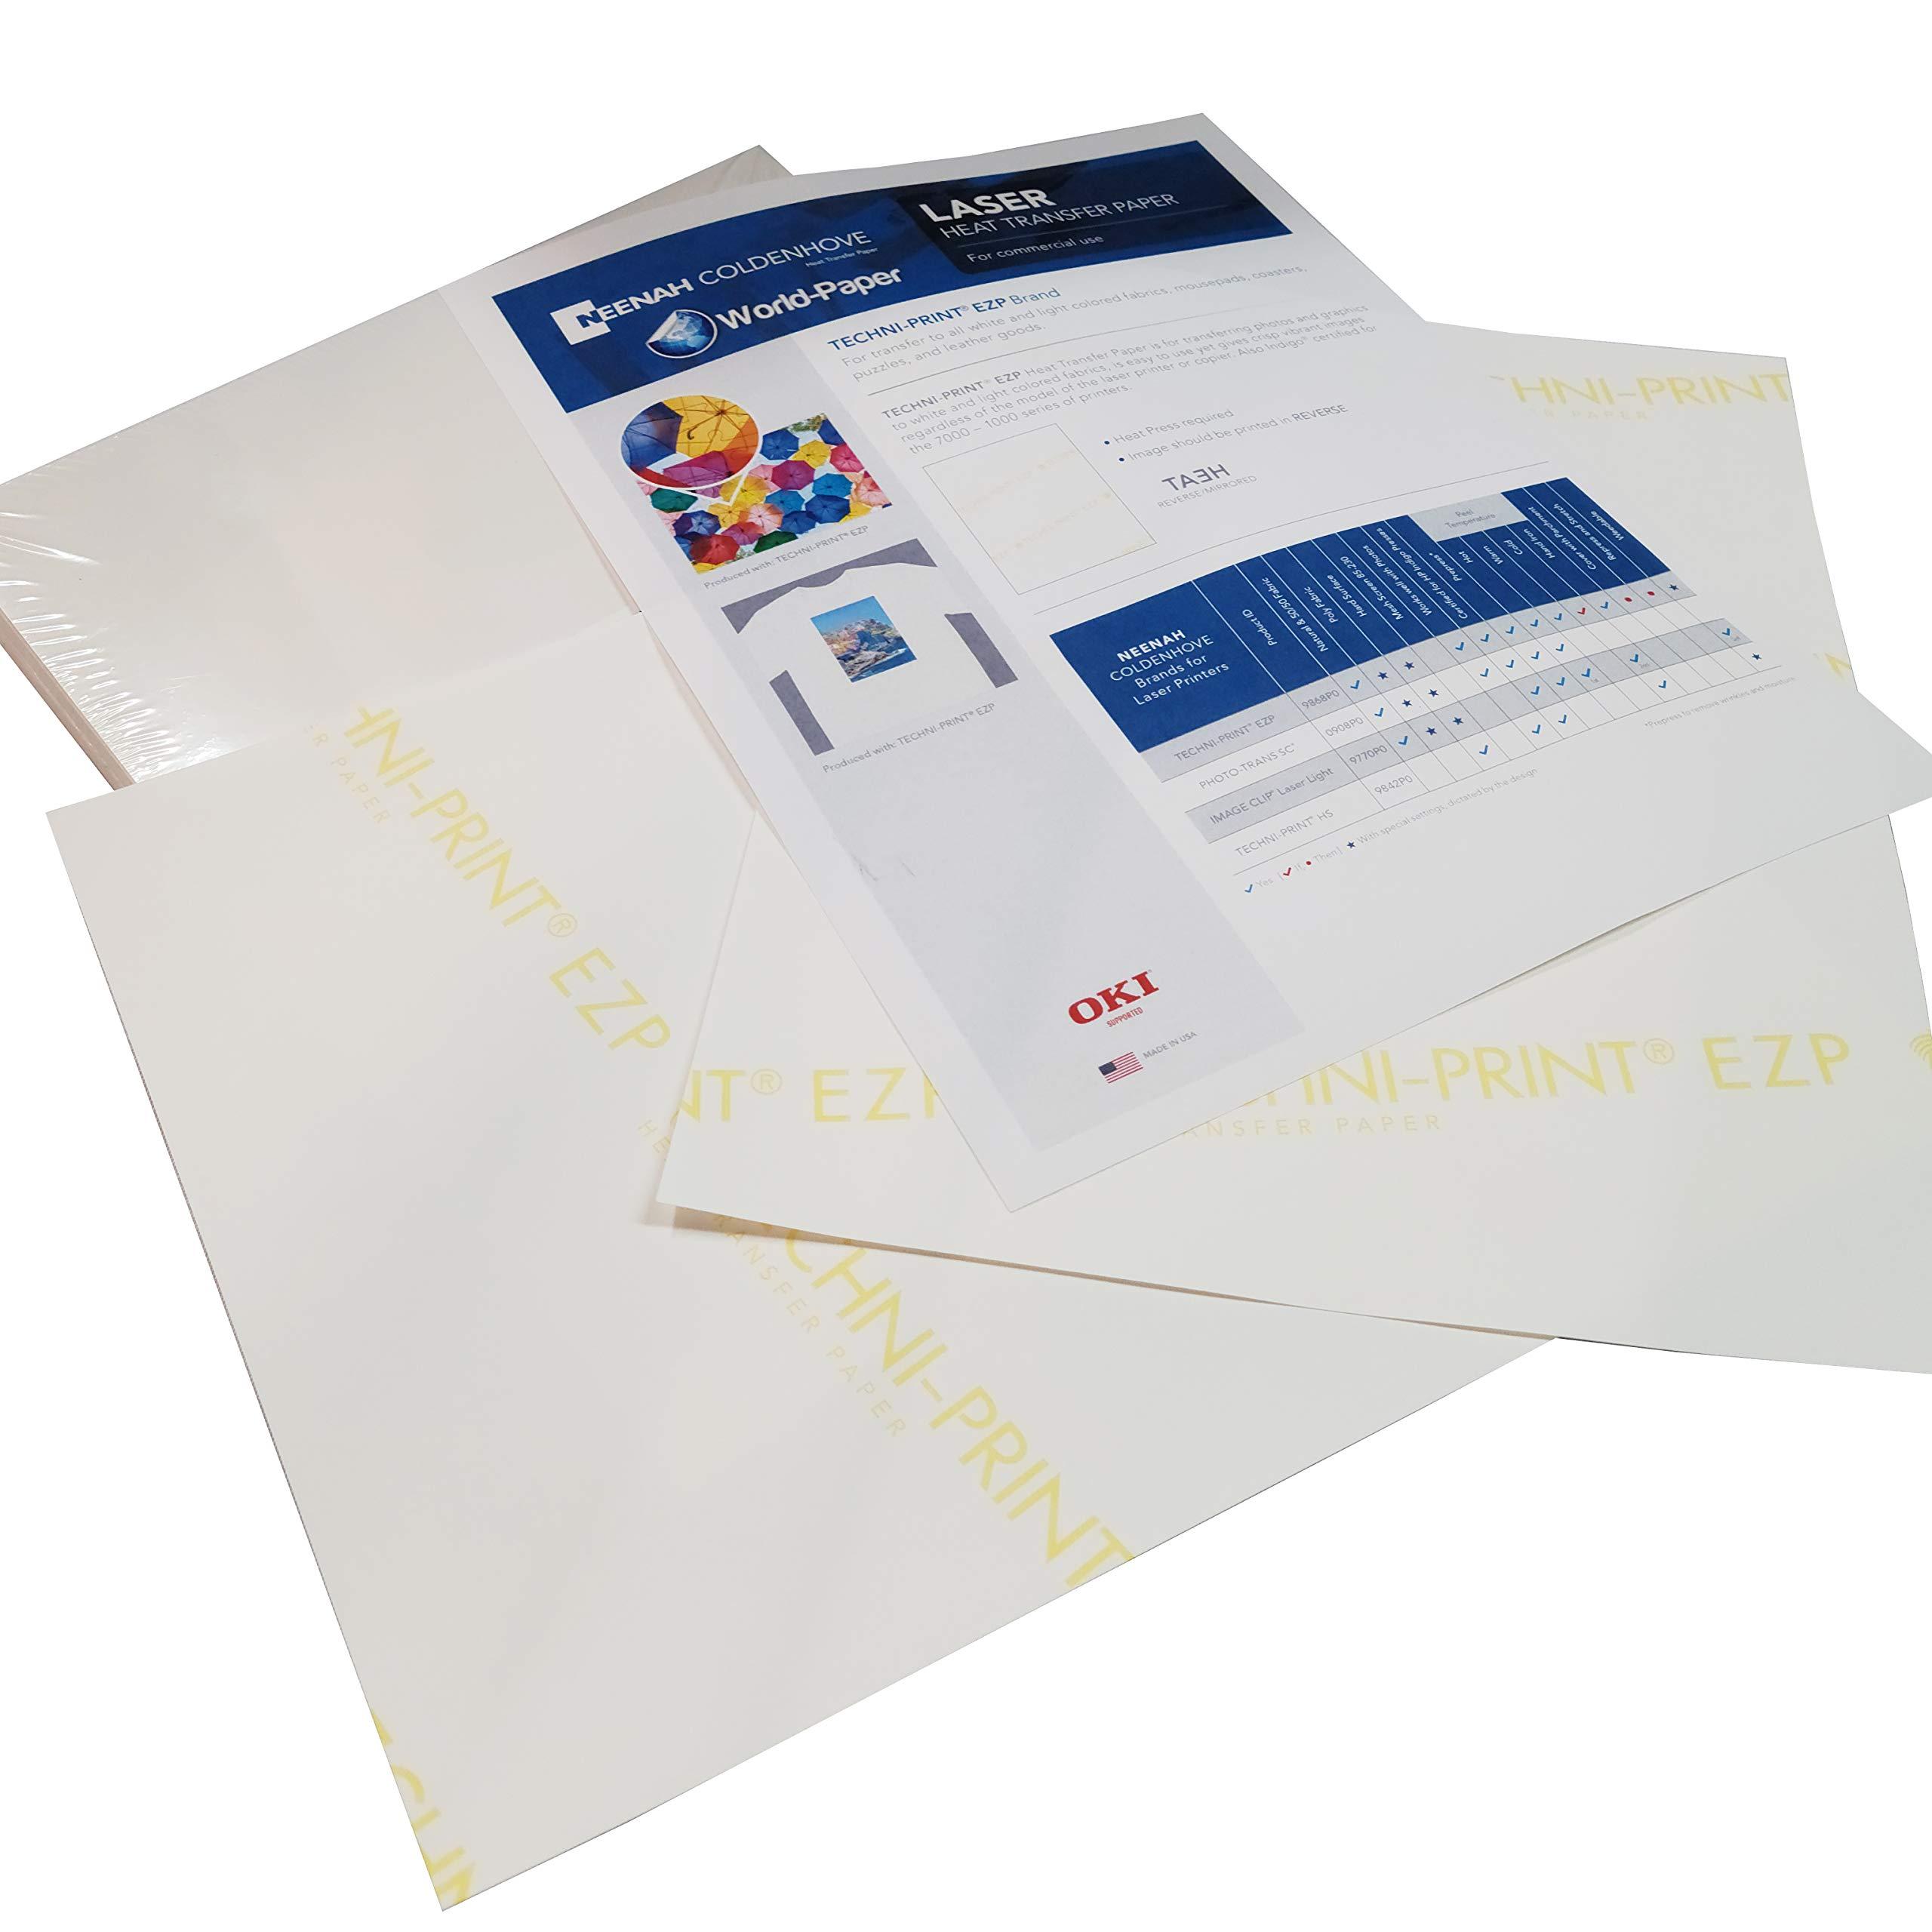 "Laser Heat Transfer Paper, for Light Fabric - Techni Print EZP- 10 Sheets - 8.5"" x 11"""